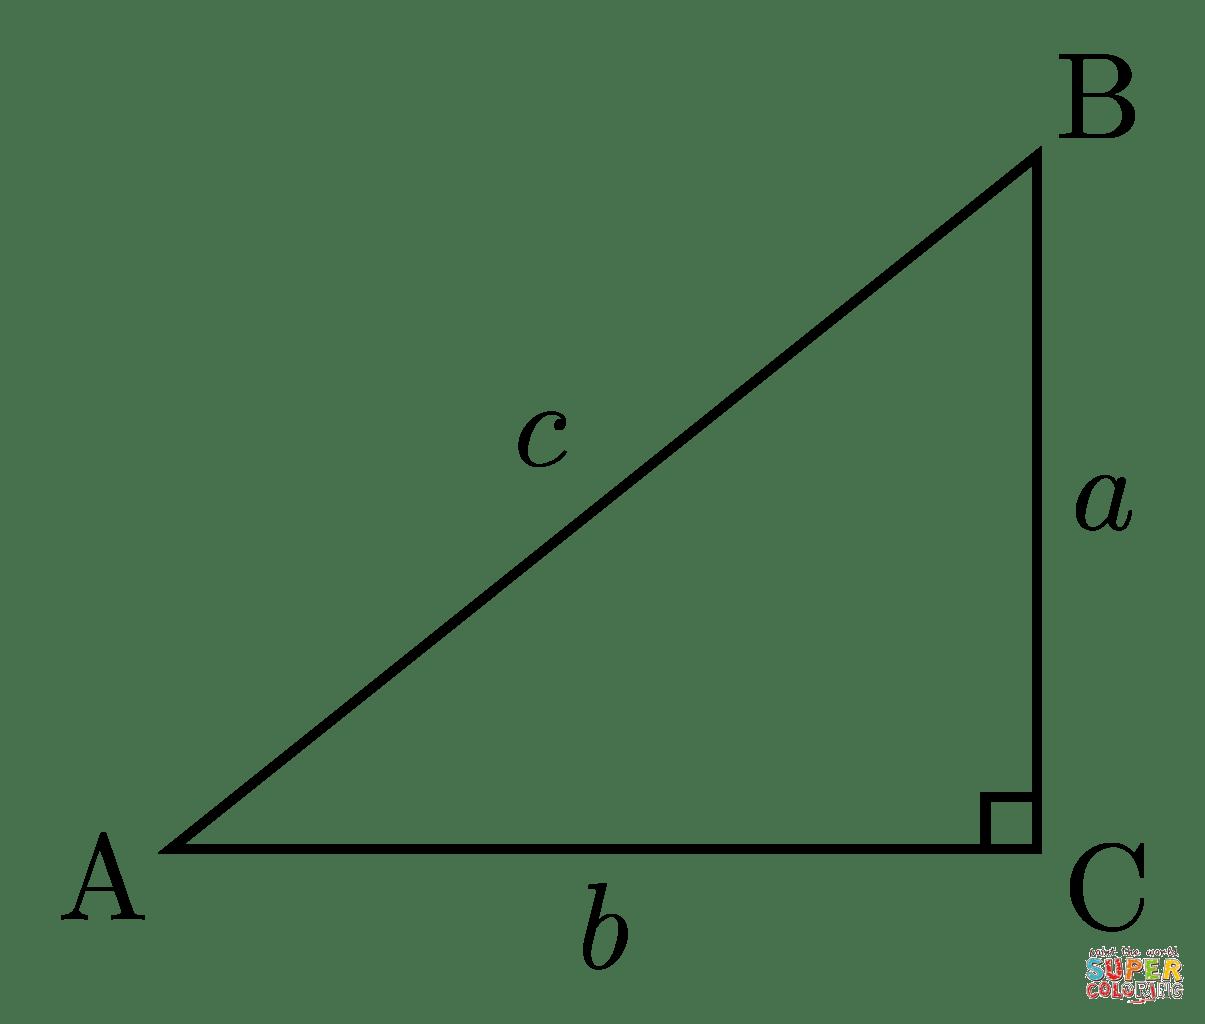 Desenho De Triângulo Retângulo Para Colorir